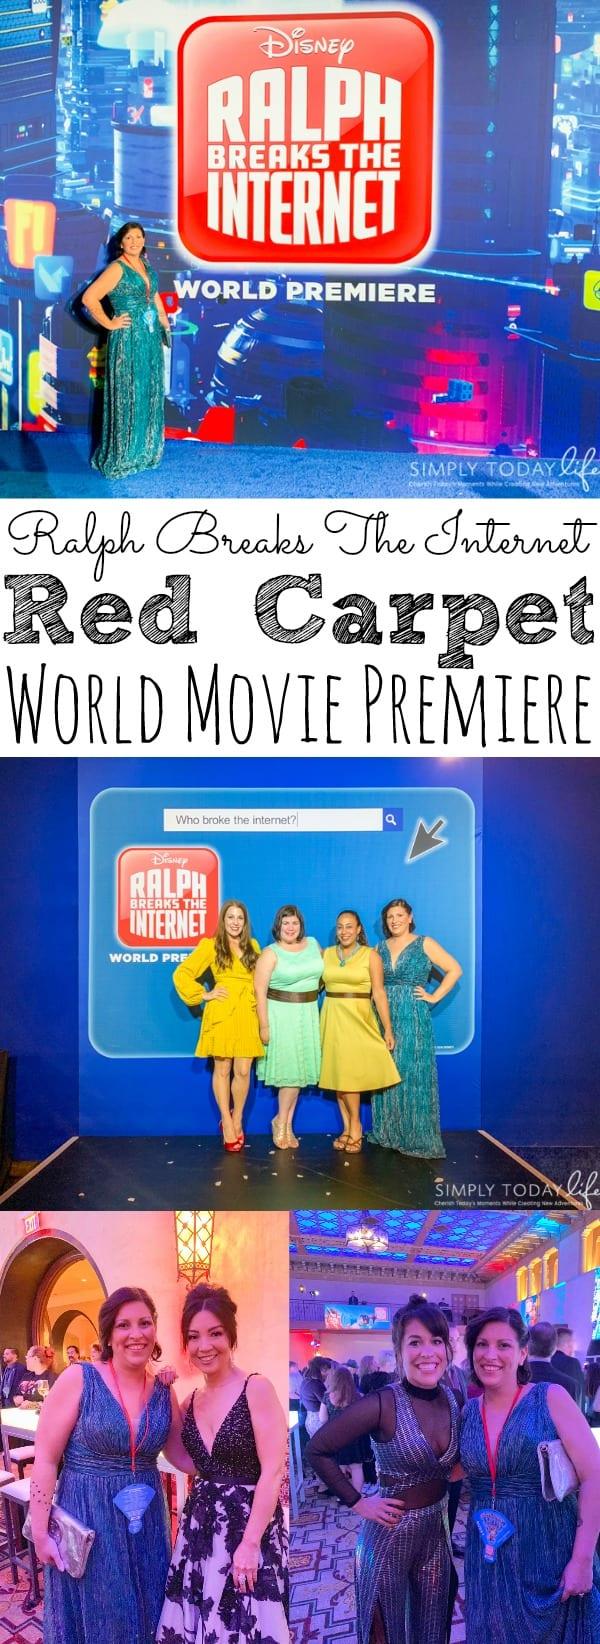 Ralph Breaks the Internet Red Carpet World Movie Premiere - simplytodaylife.com